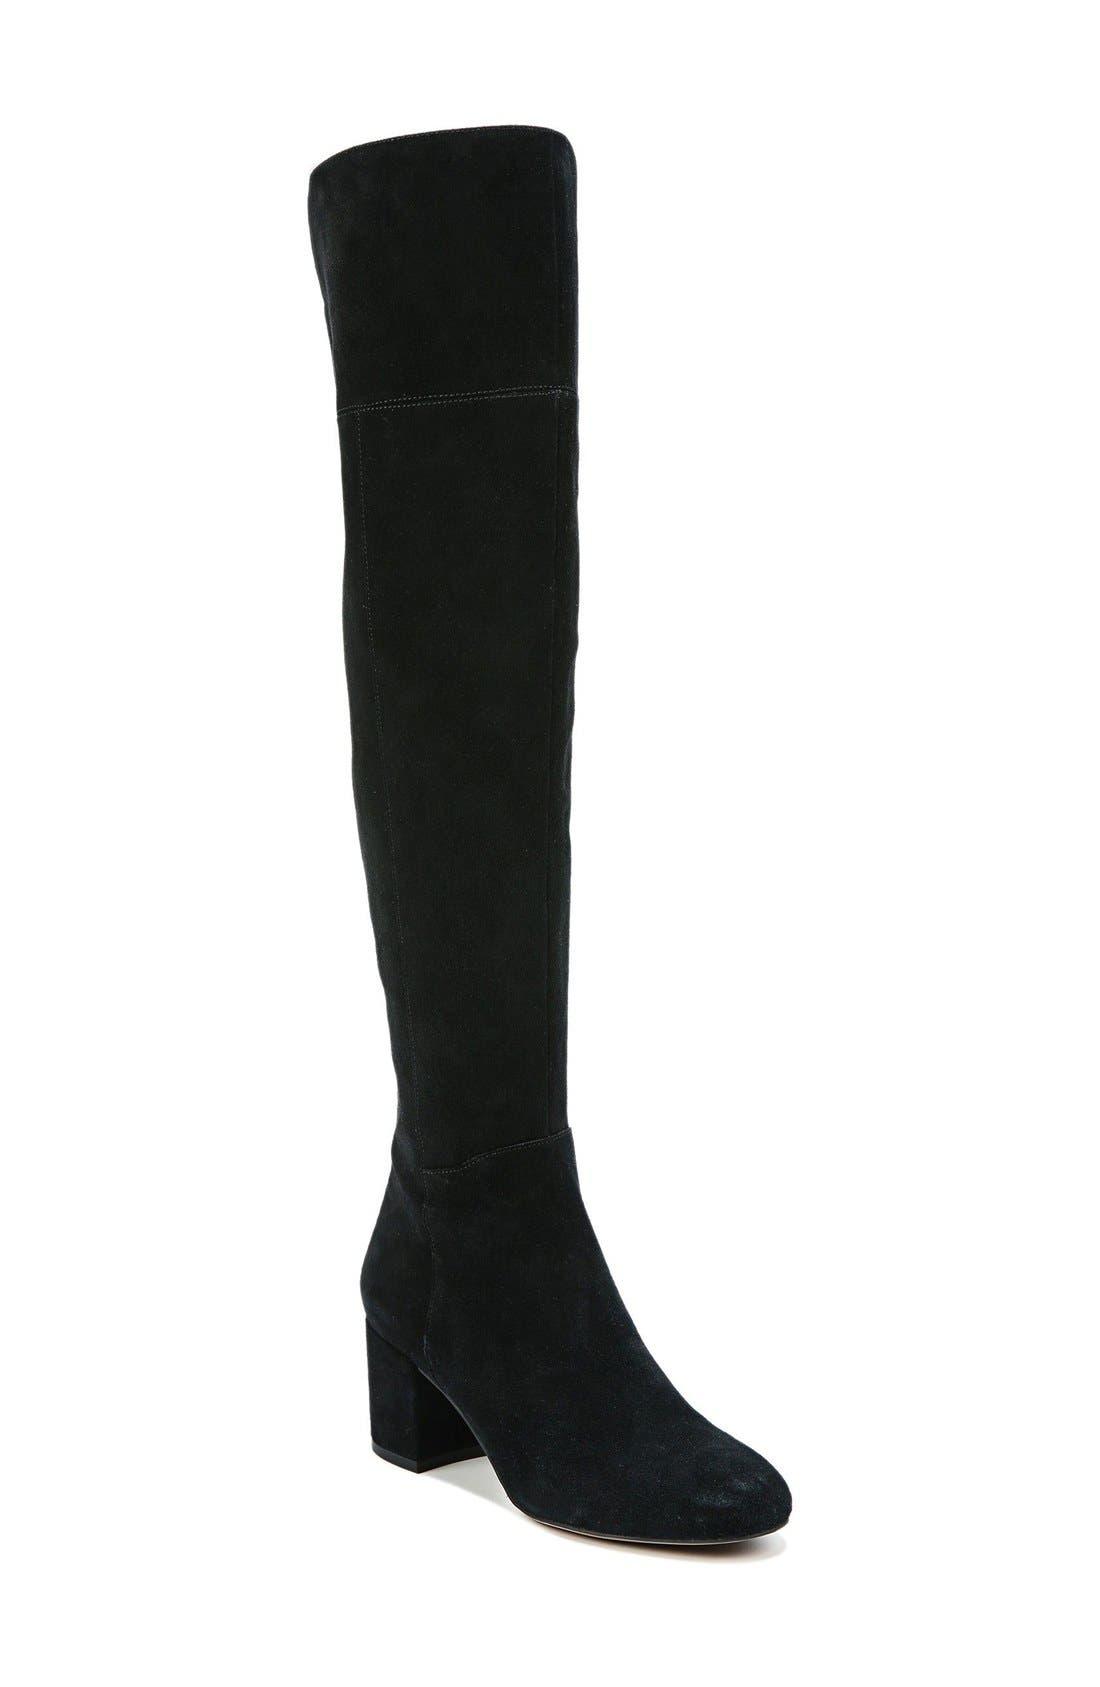 Alternate Image 1 Selected - Franco Sarto Kerri Over the Knee Boot (Women)